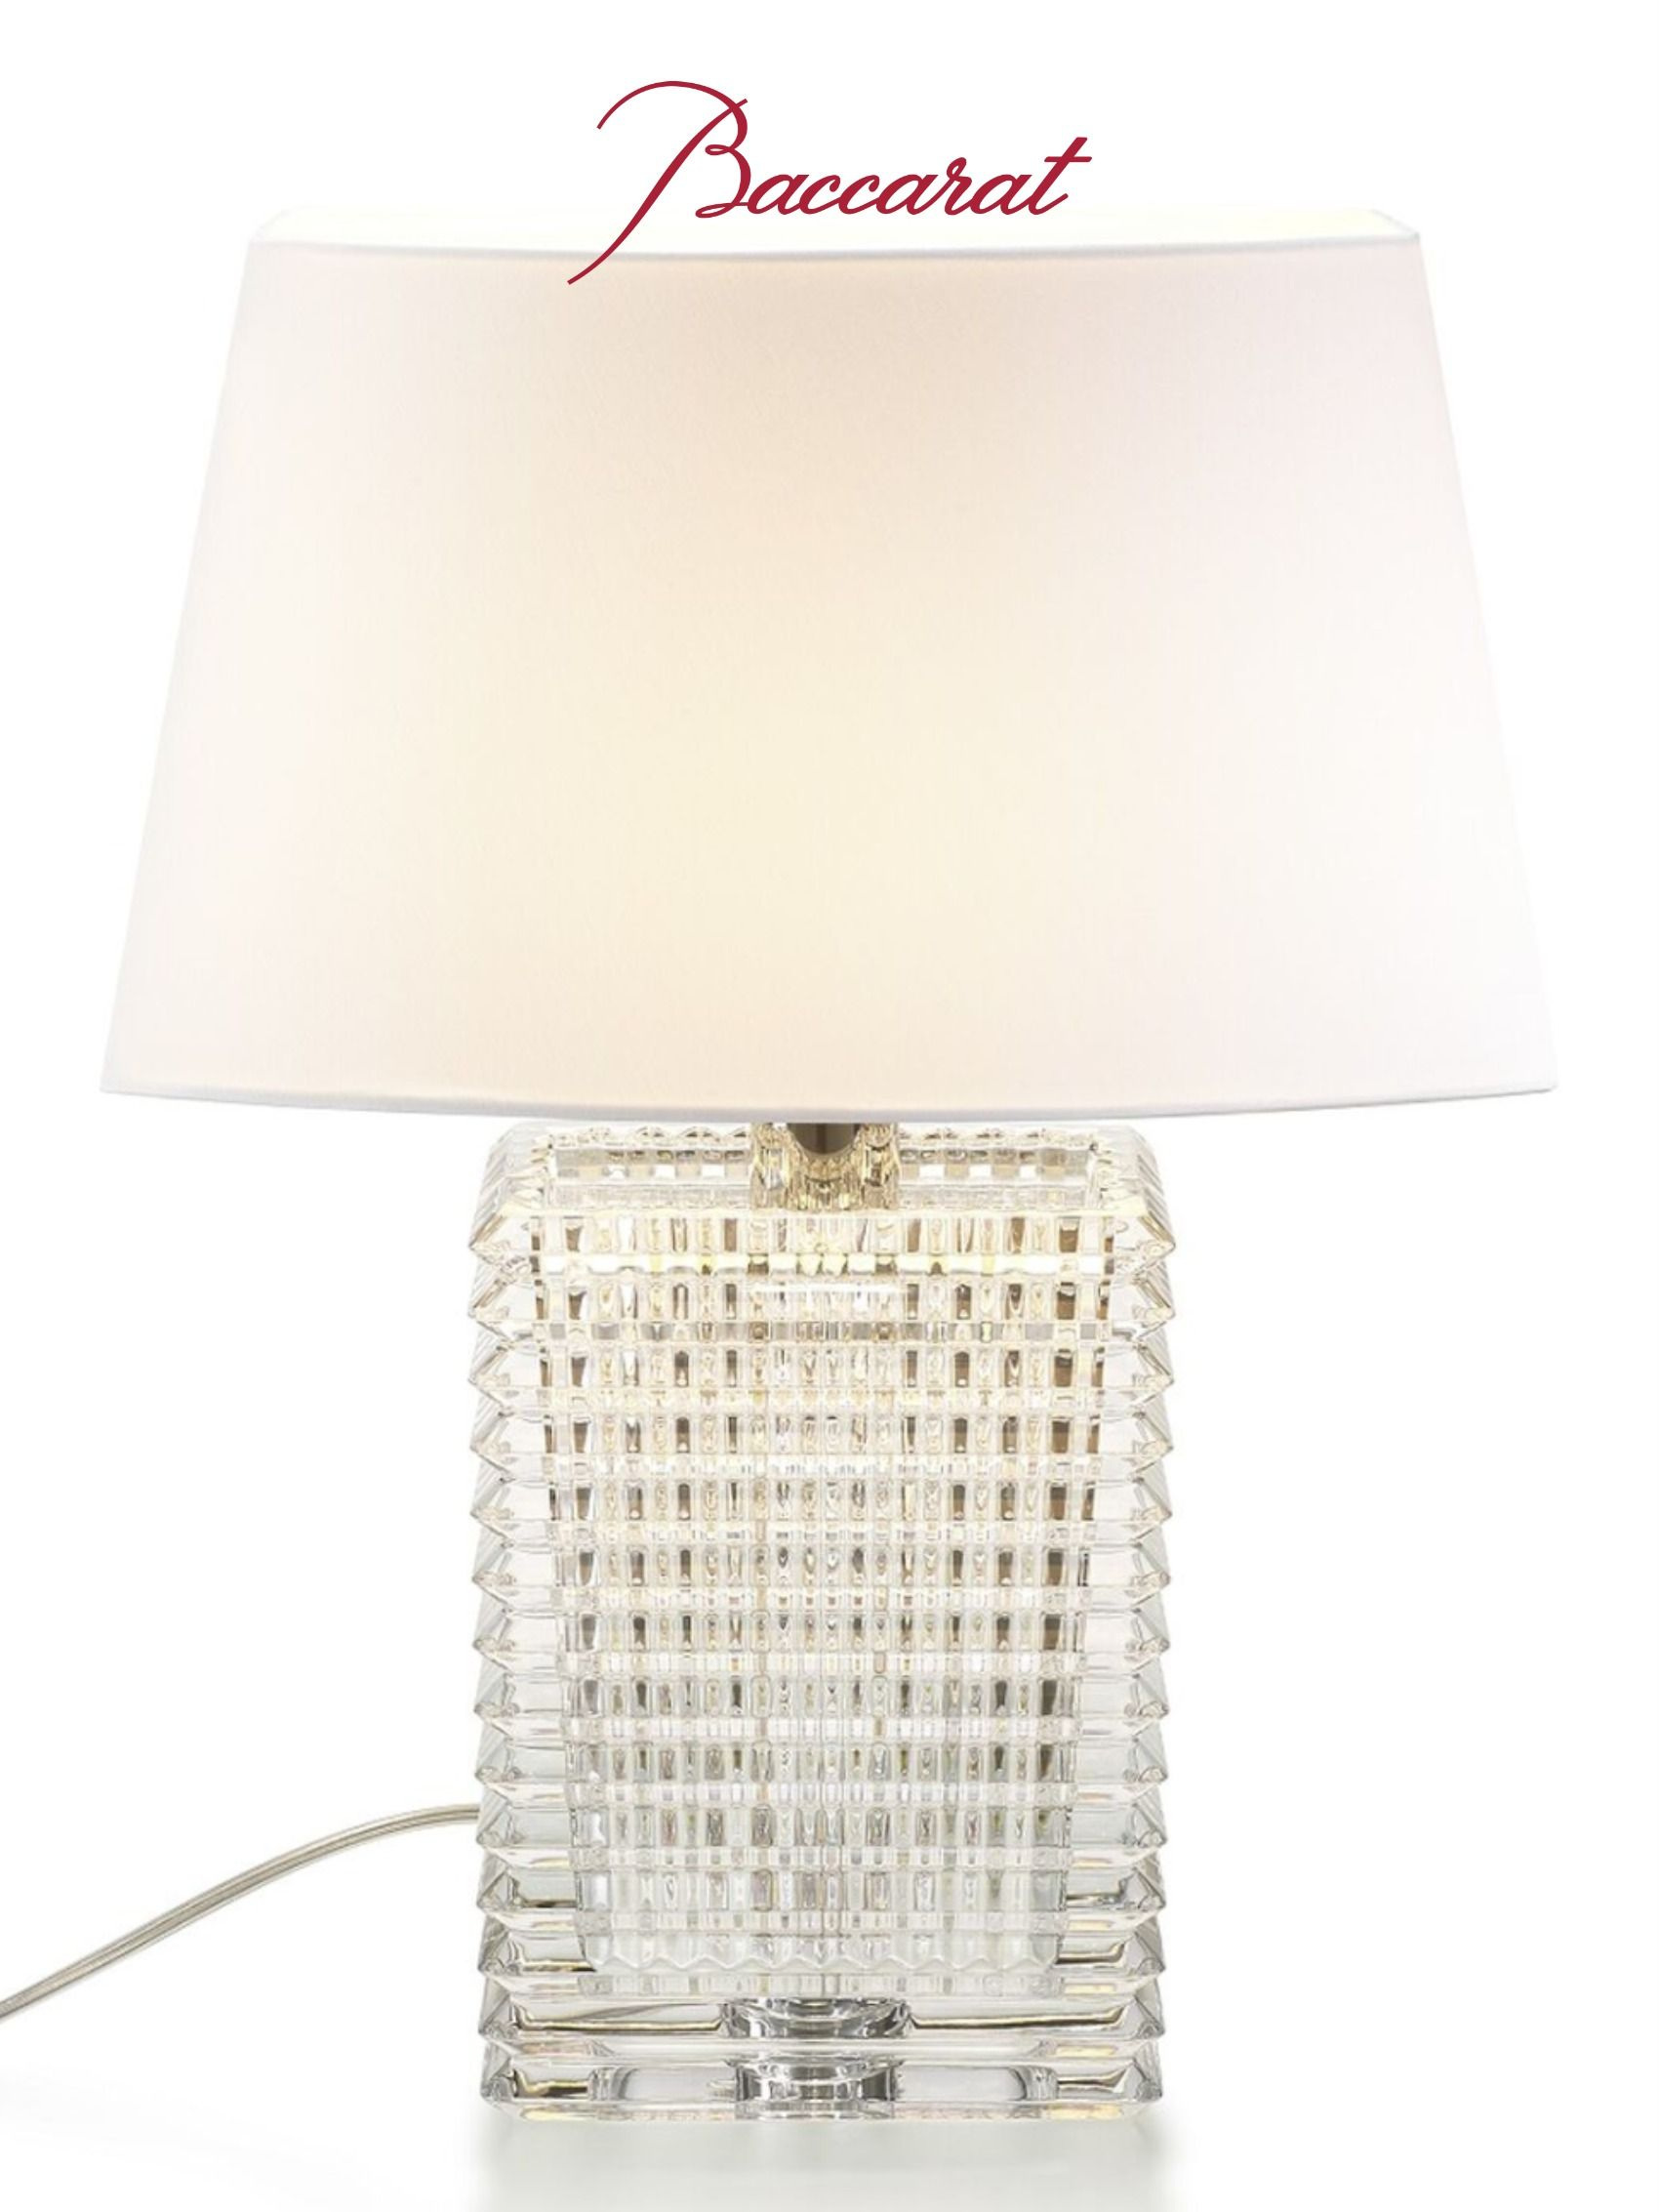 Eye Lamp In 2020 Lamp Crystal Lamp Base Crystal Lamp